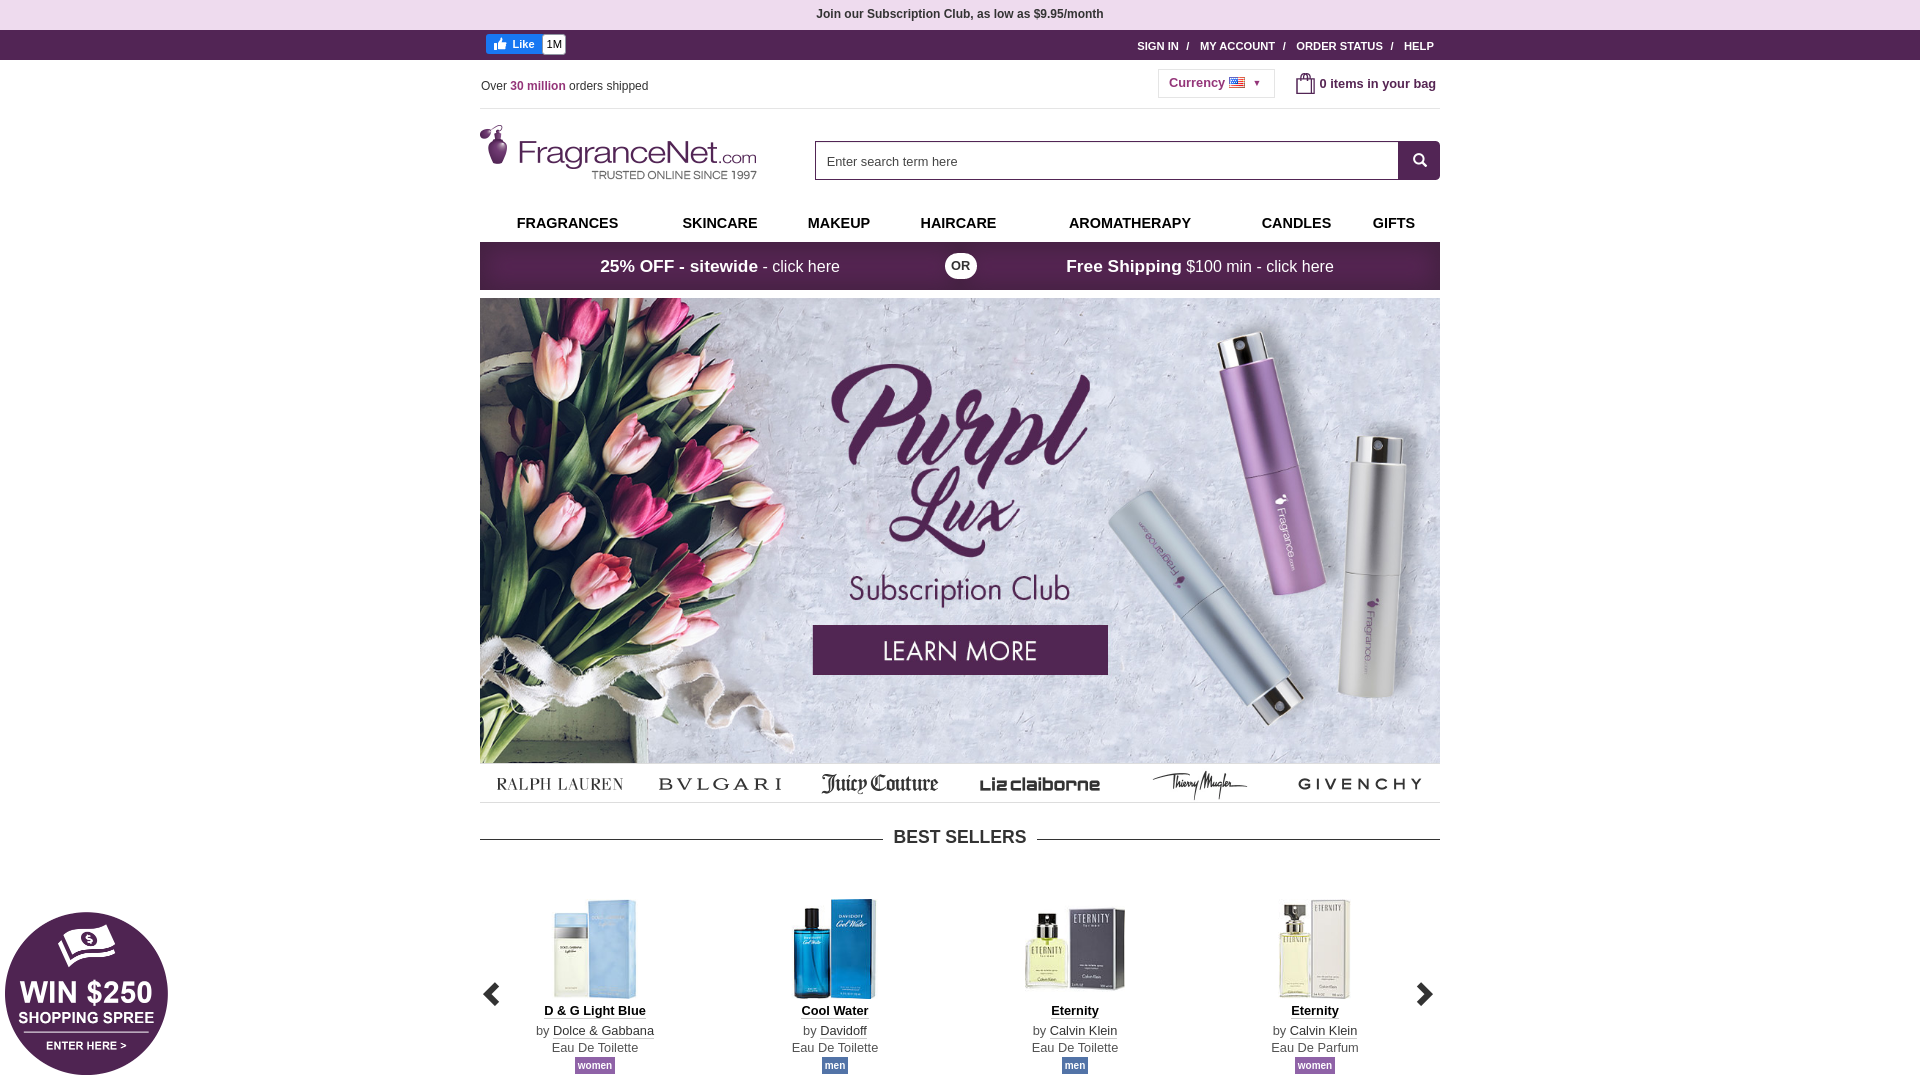 FragranceNet.com / CPS website